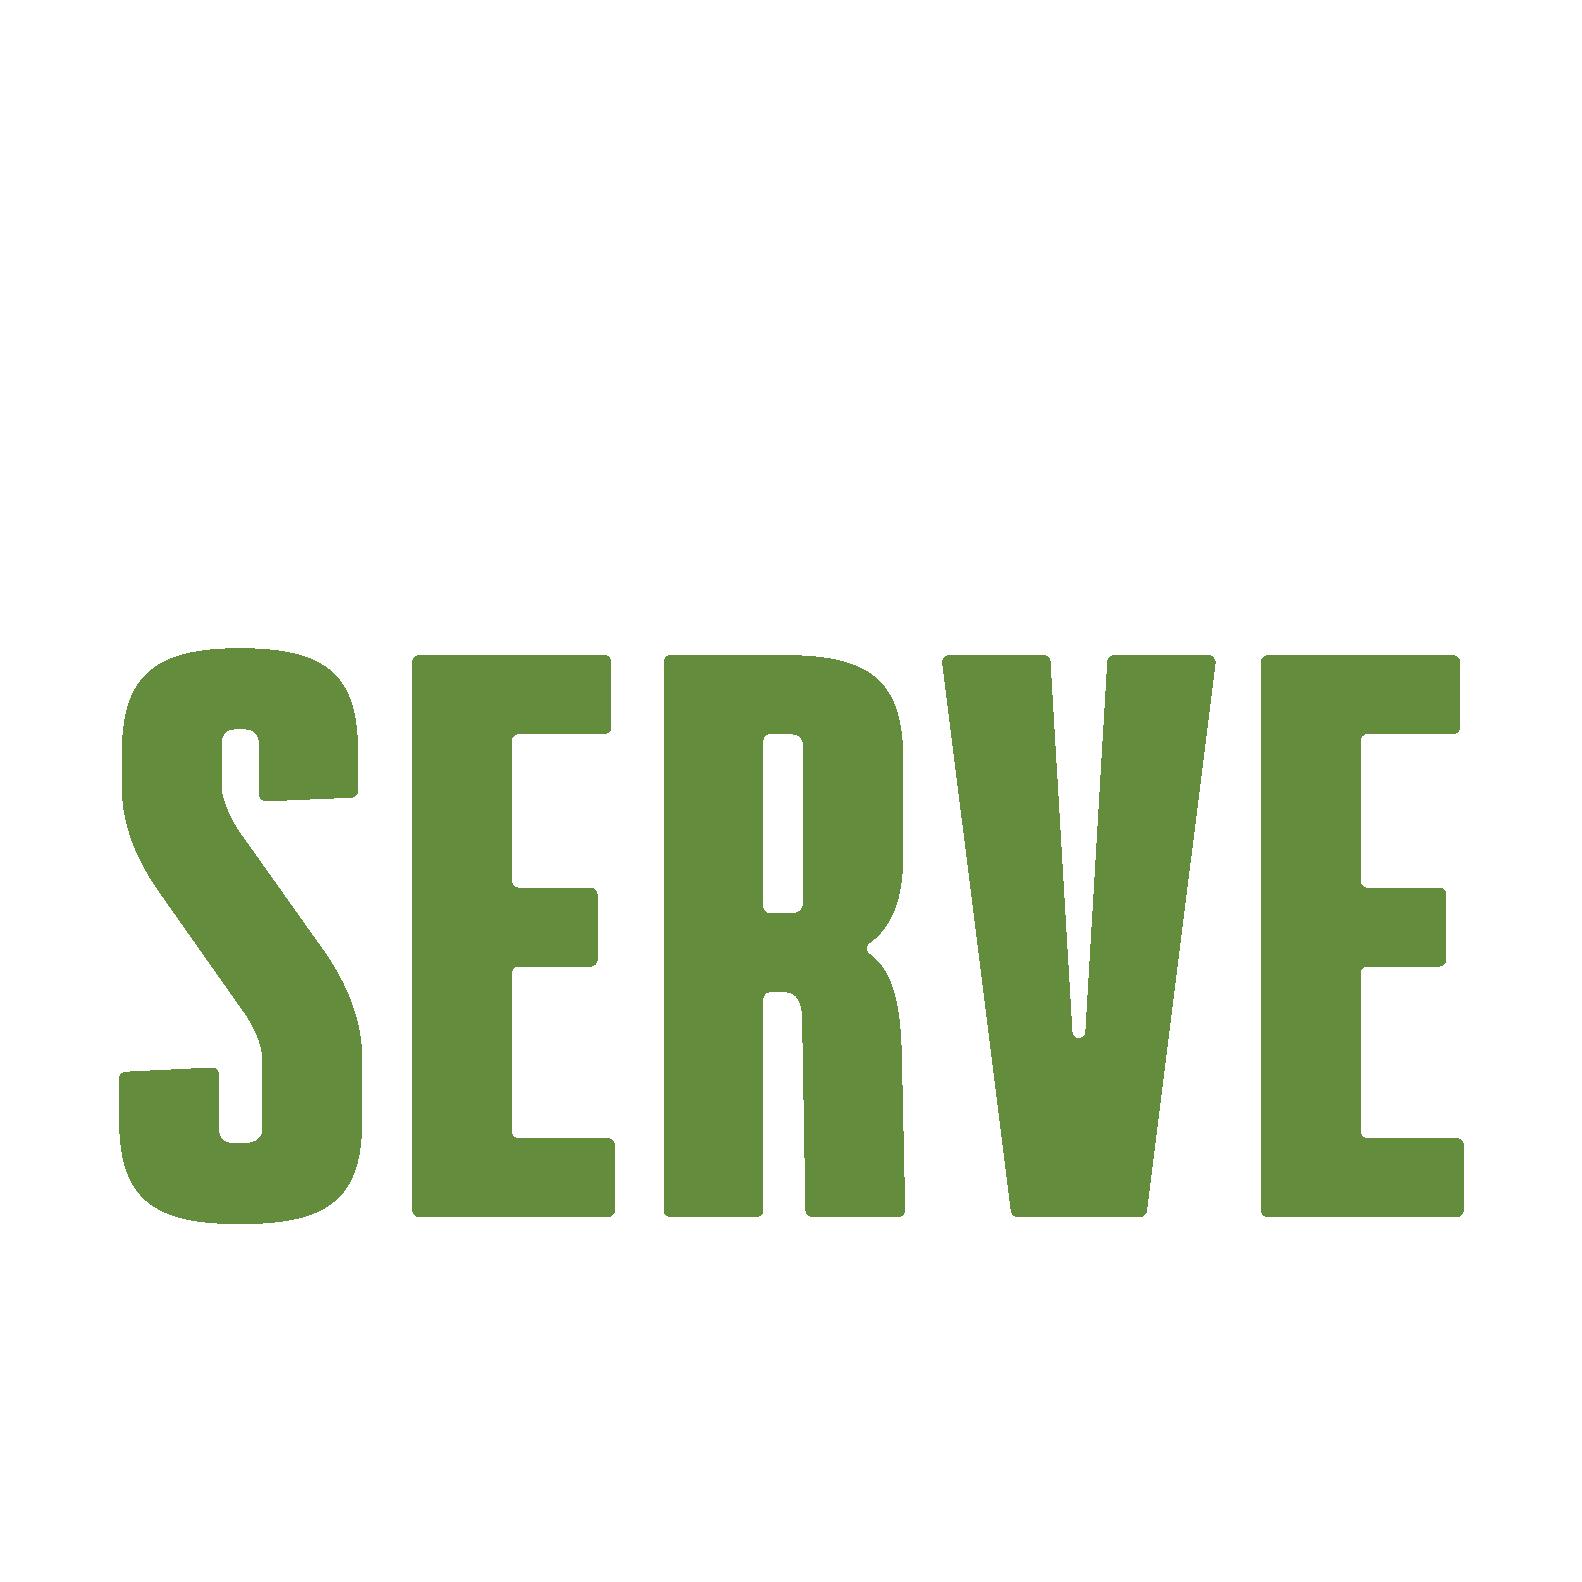 FiveOaksServe-CMYK_whitegreen.png